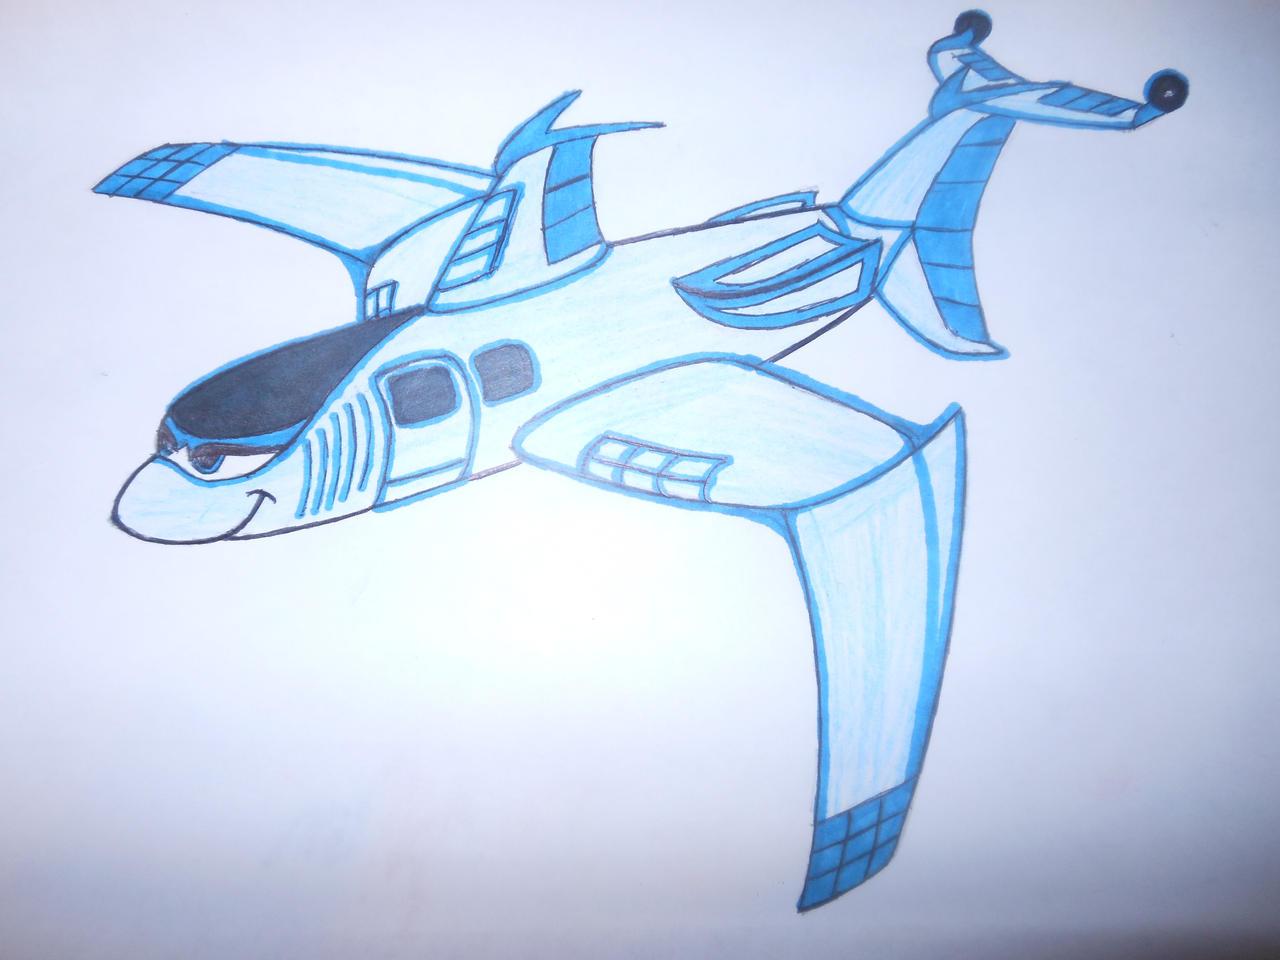 Shark Plane 2.0 AKA Salley by sgtjack2016